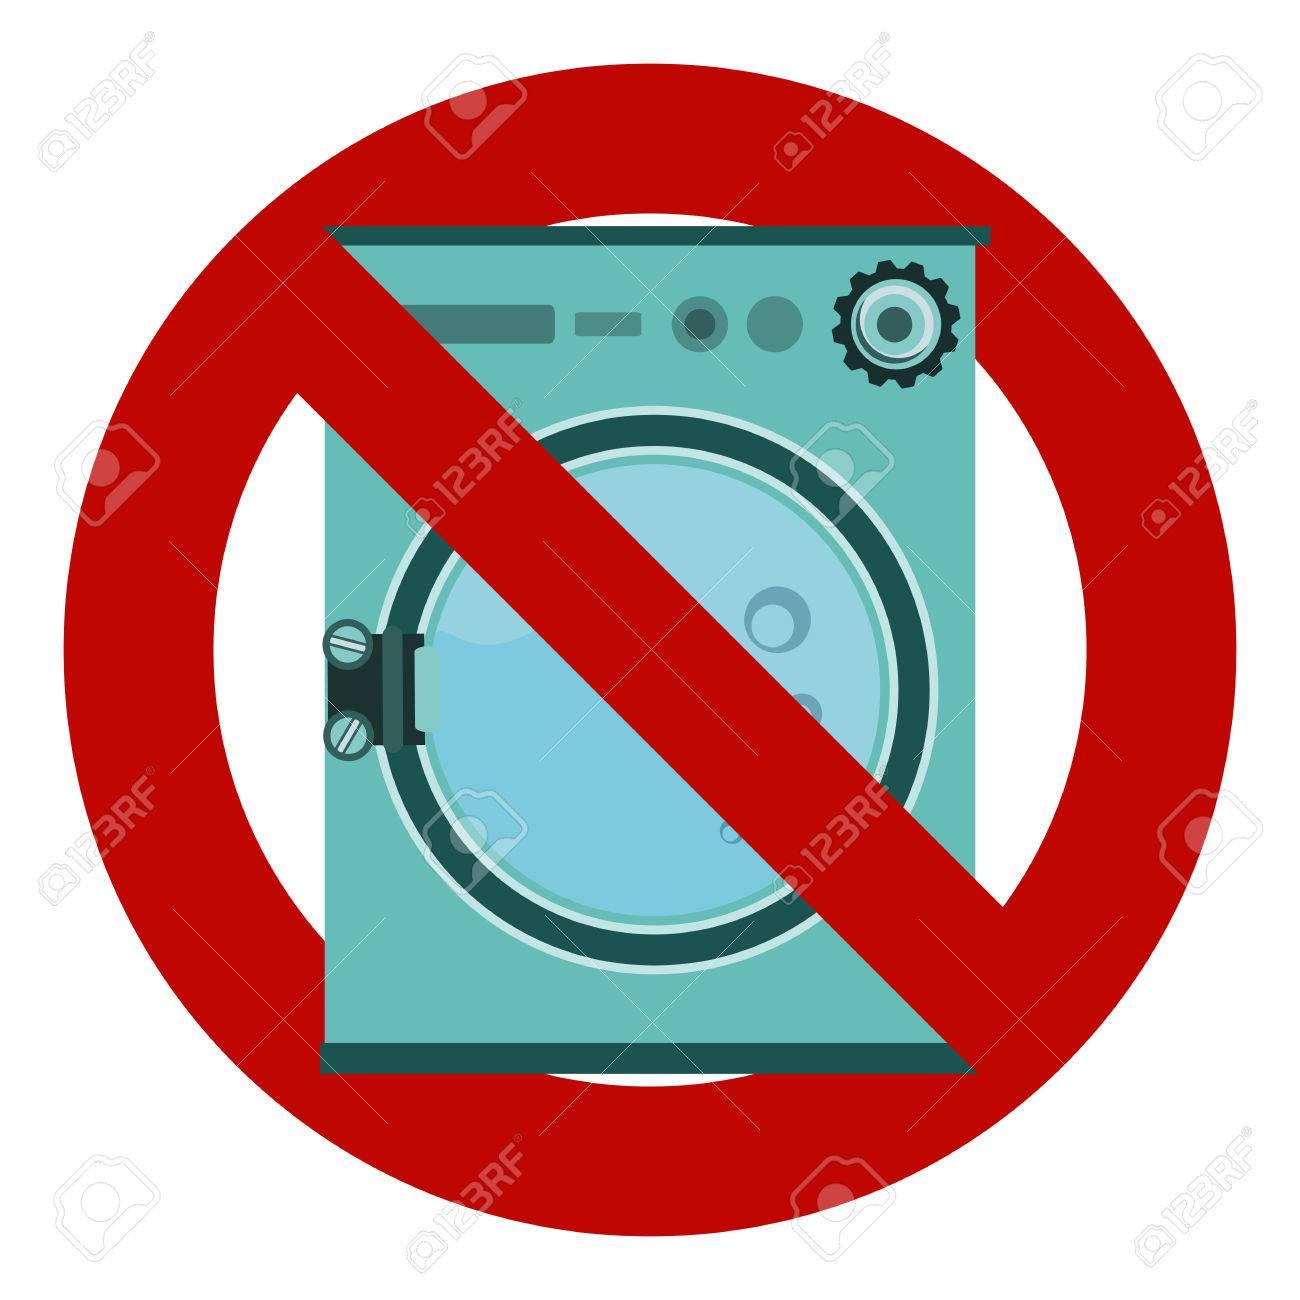 Do not wash washing machine a prohibitory sign stop no do not wash washing machine a prohibitory sign stop no stock biocorpaavc